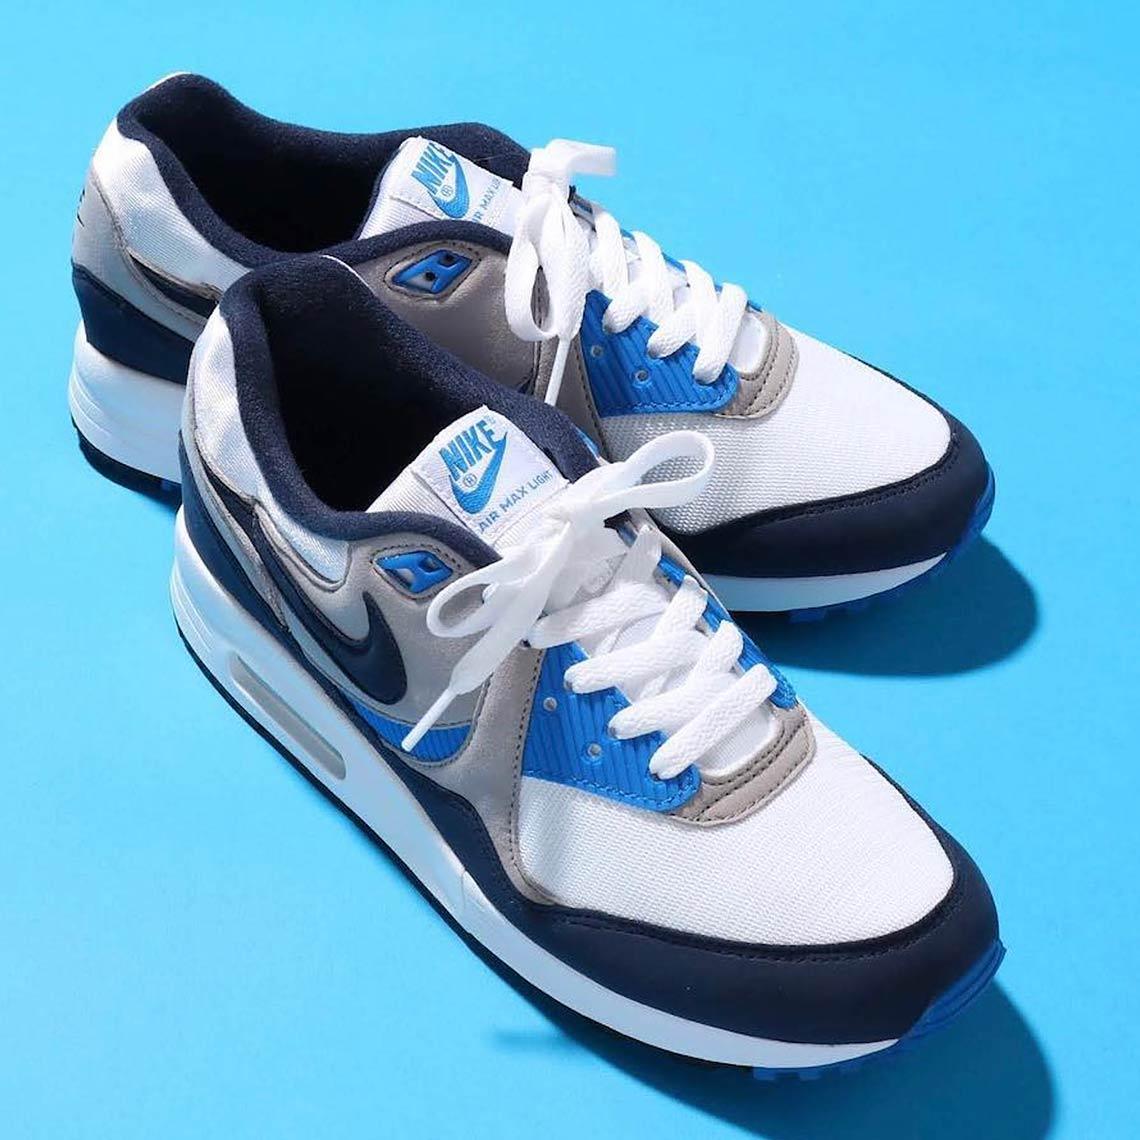 bb45d5d373c44c Nike Air Max OG Light Blue AO8285-100 Release Date